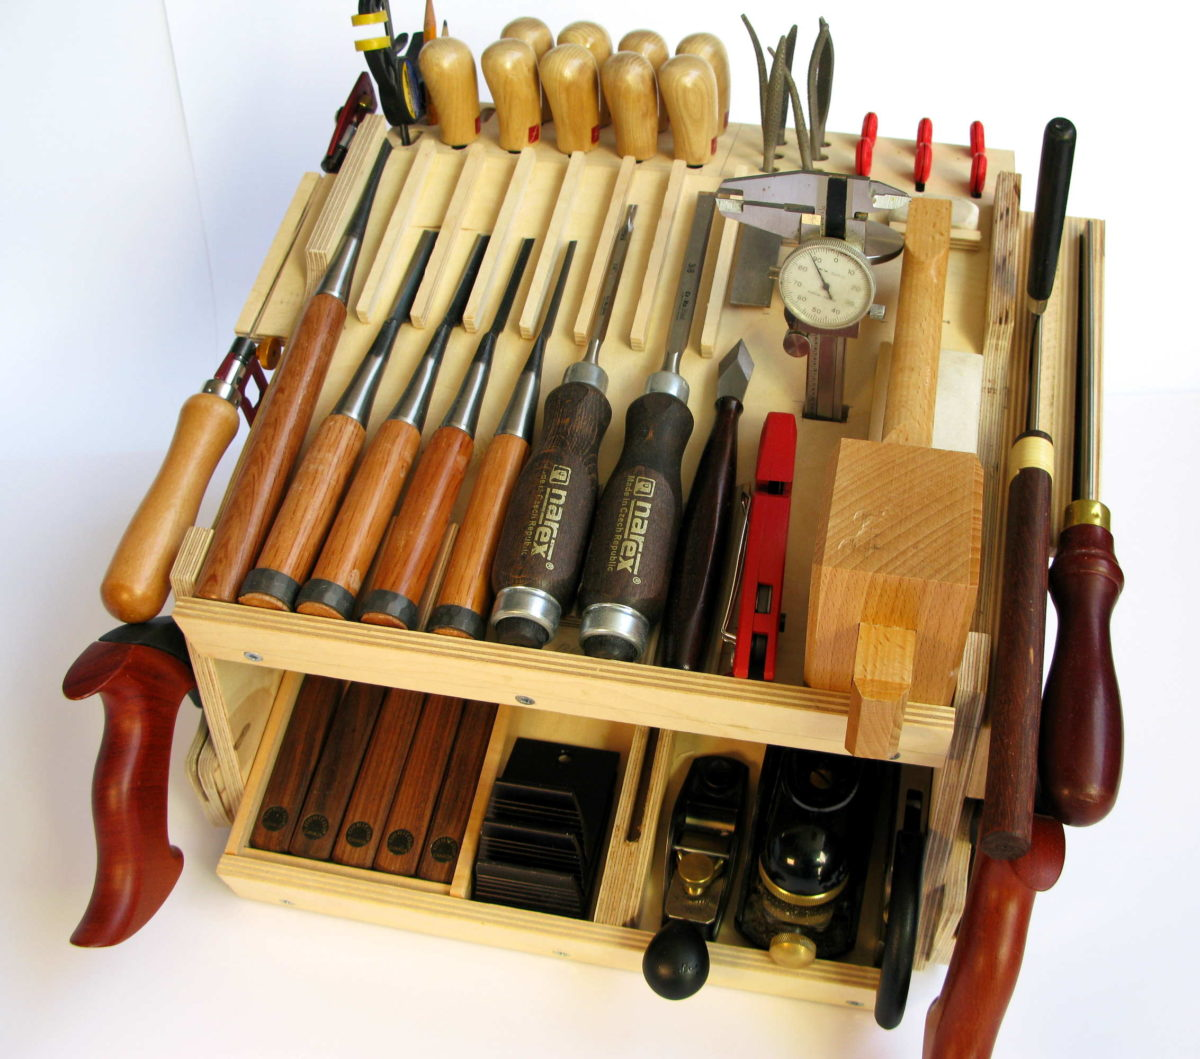 Workbench Tool Caddy - FineWoodworking